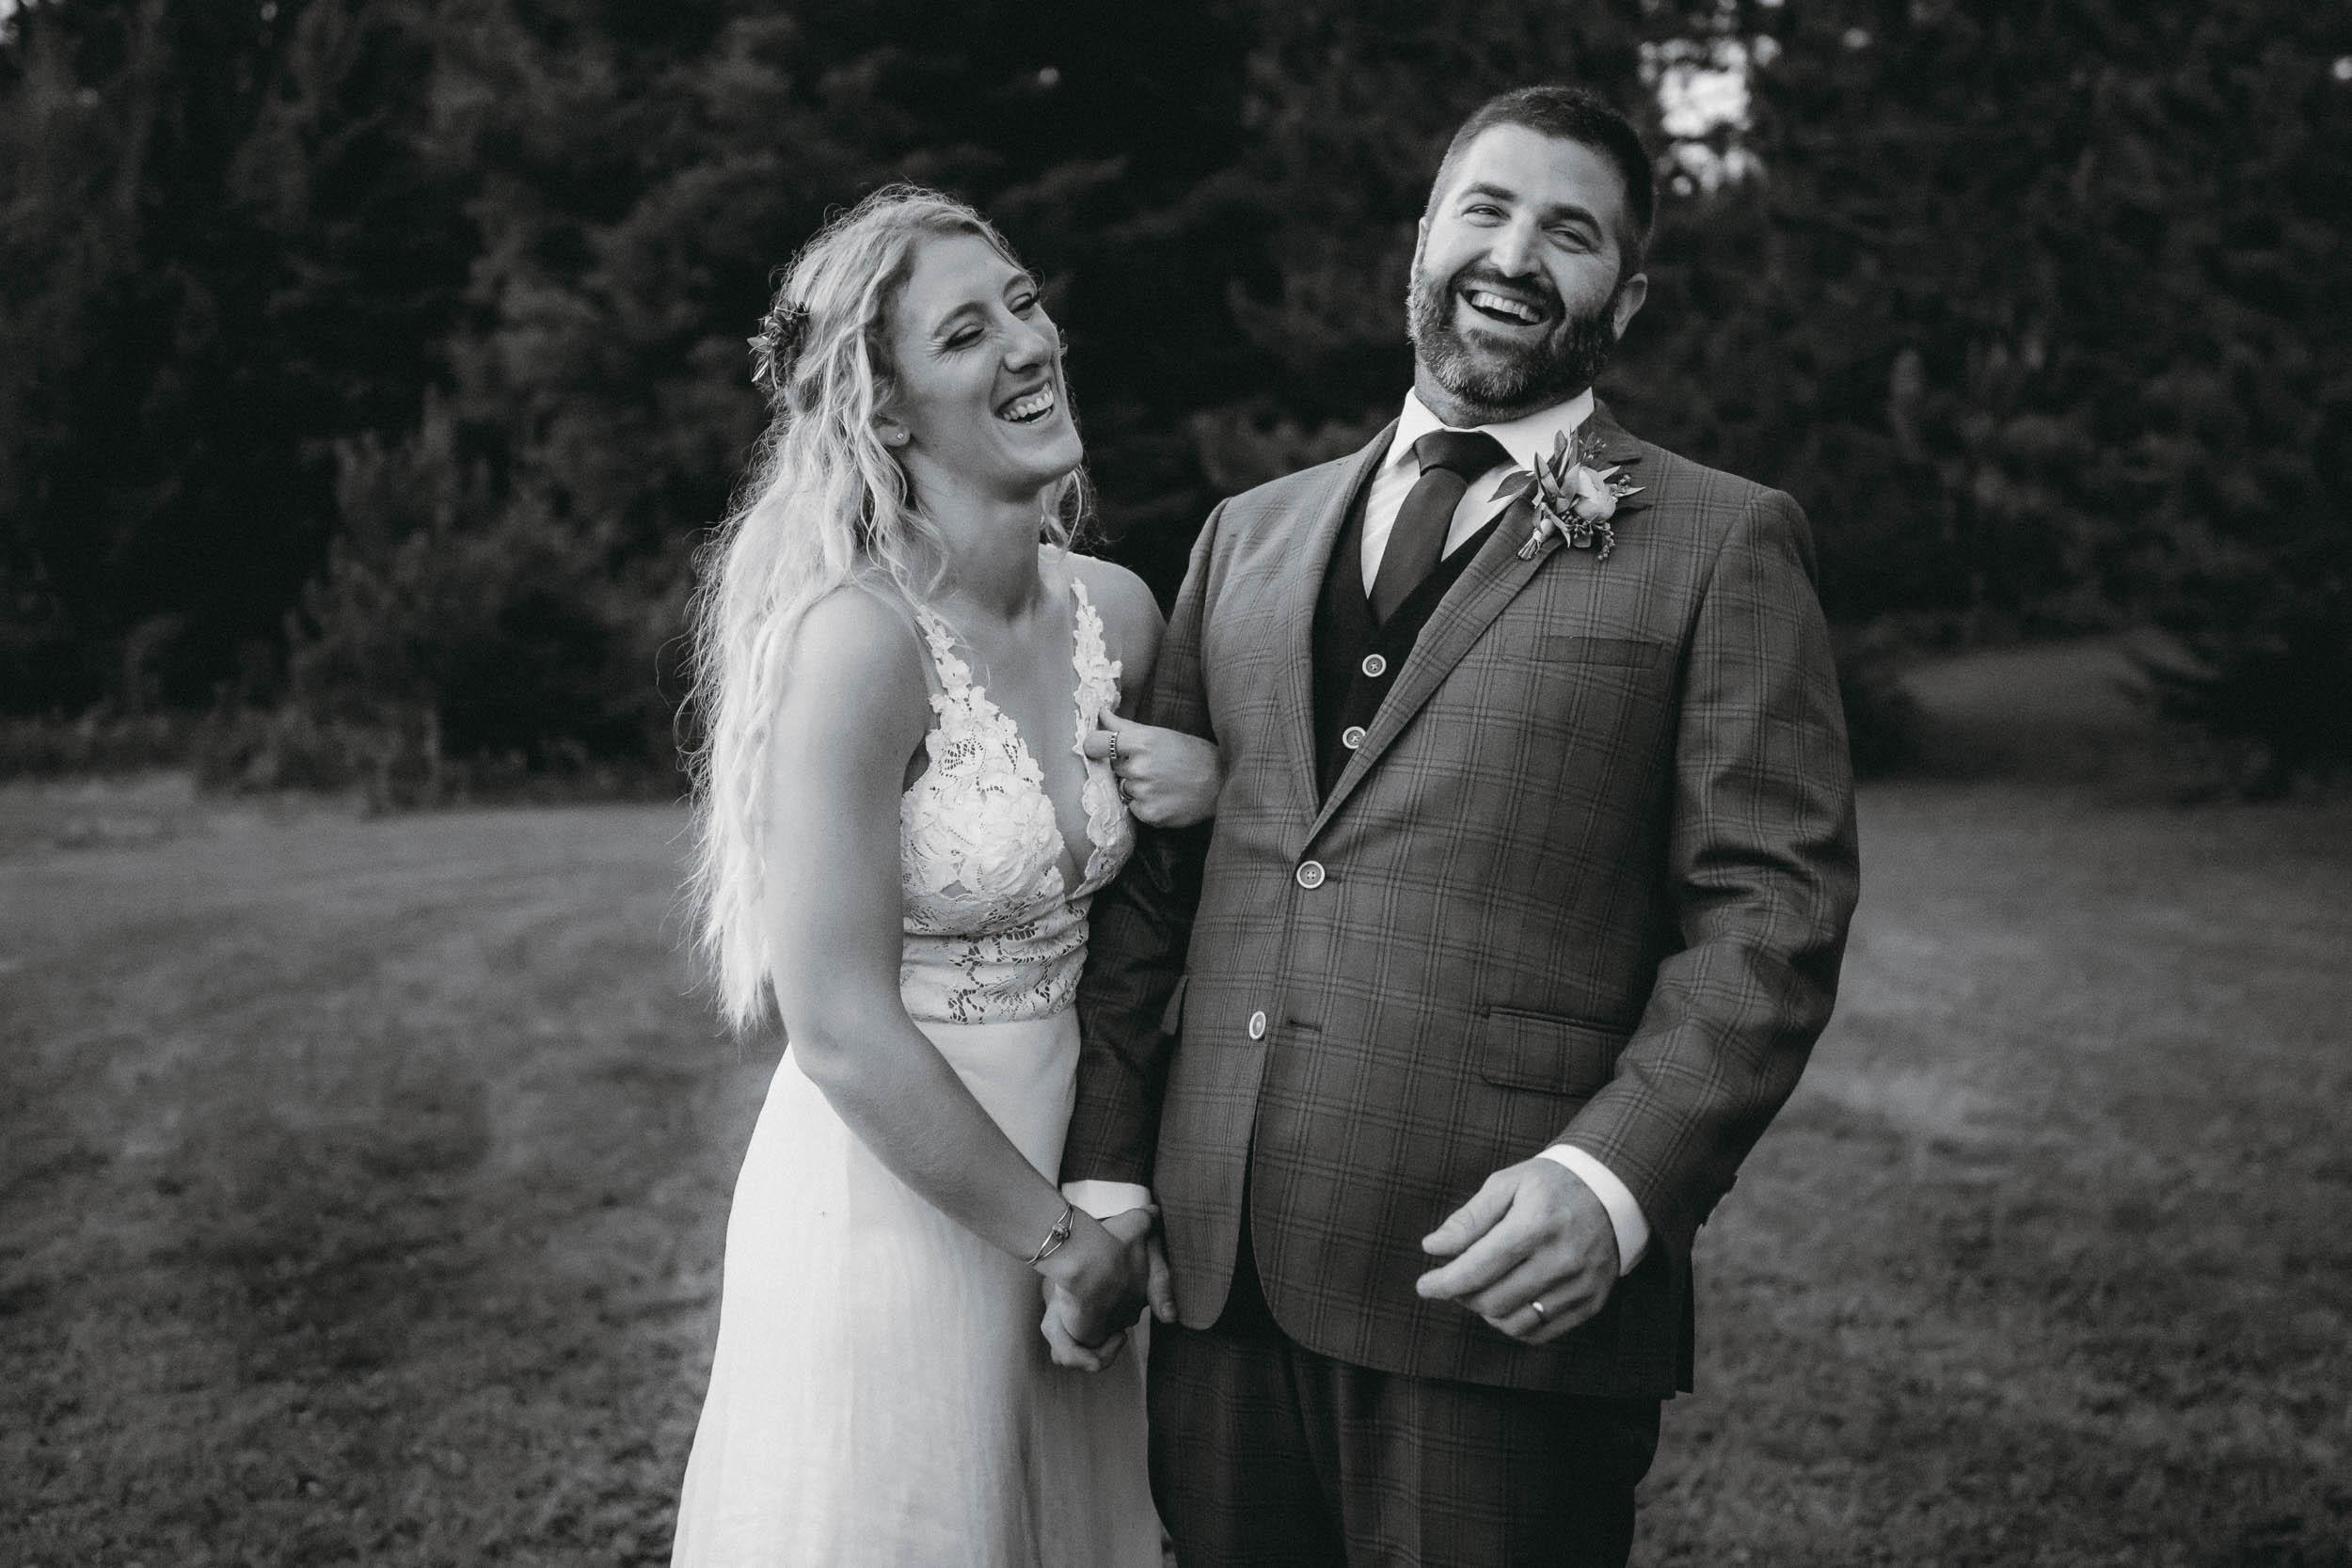 89-best minneapolis unposed documentary wedding photographer-1.jpg